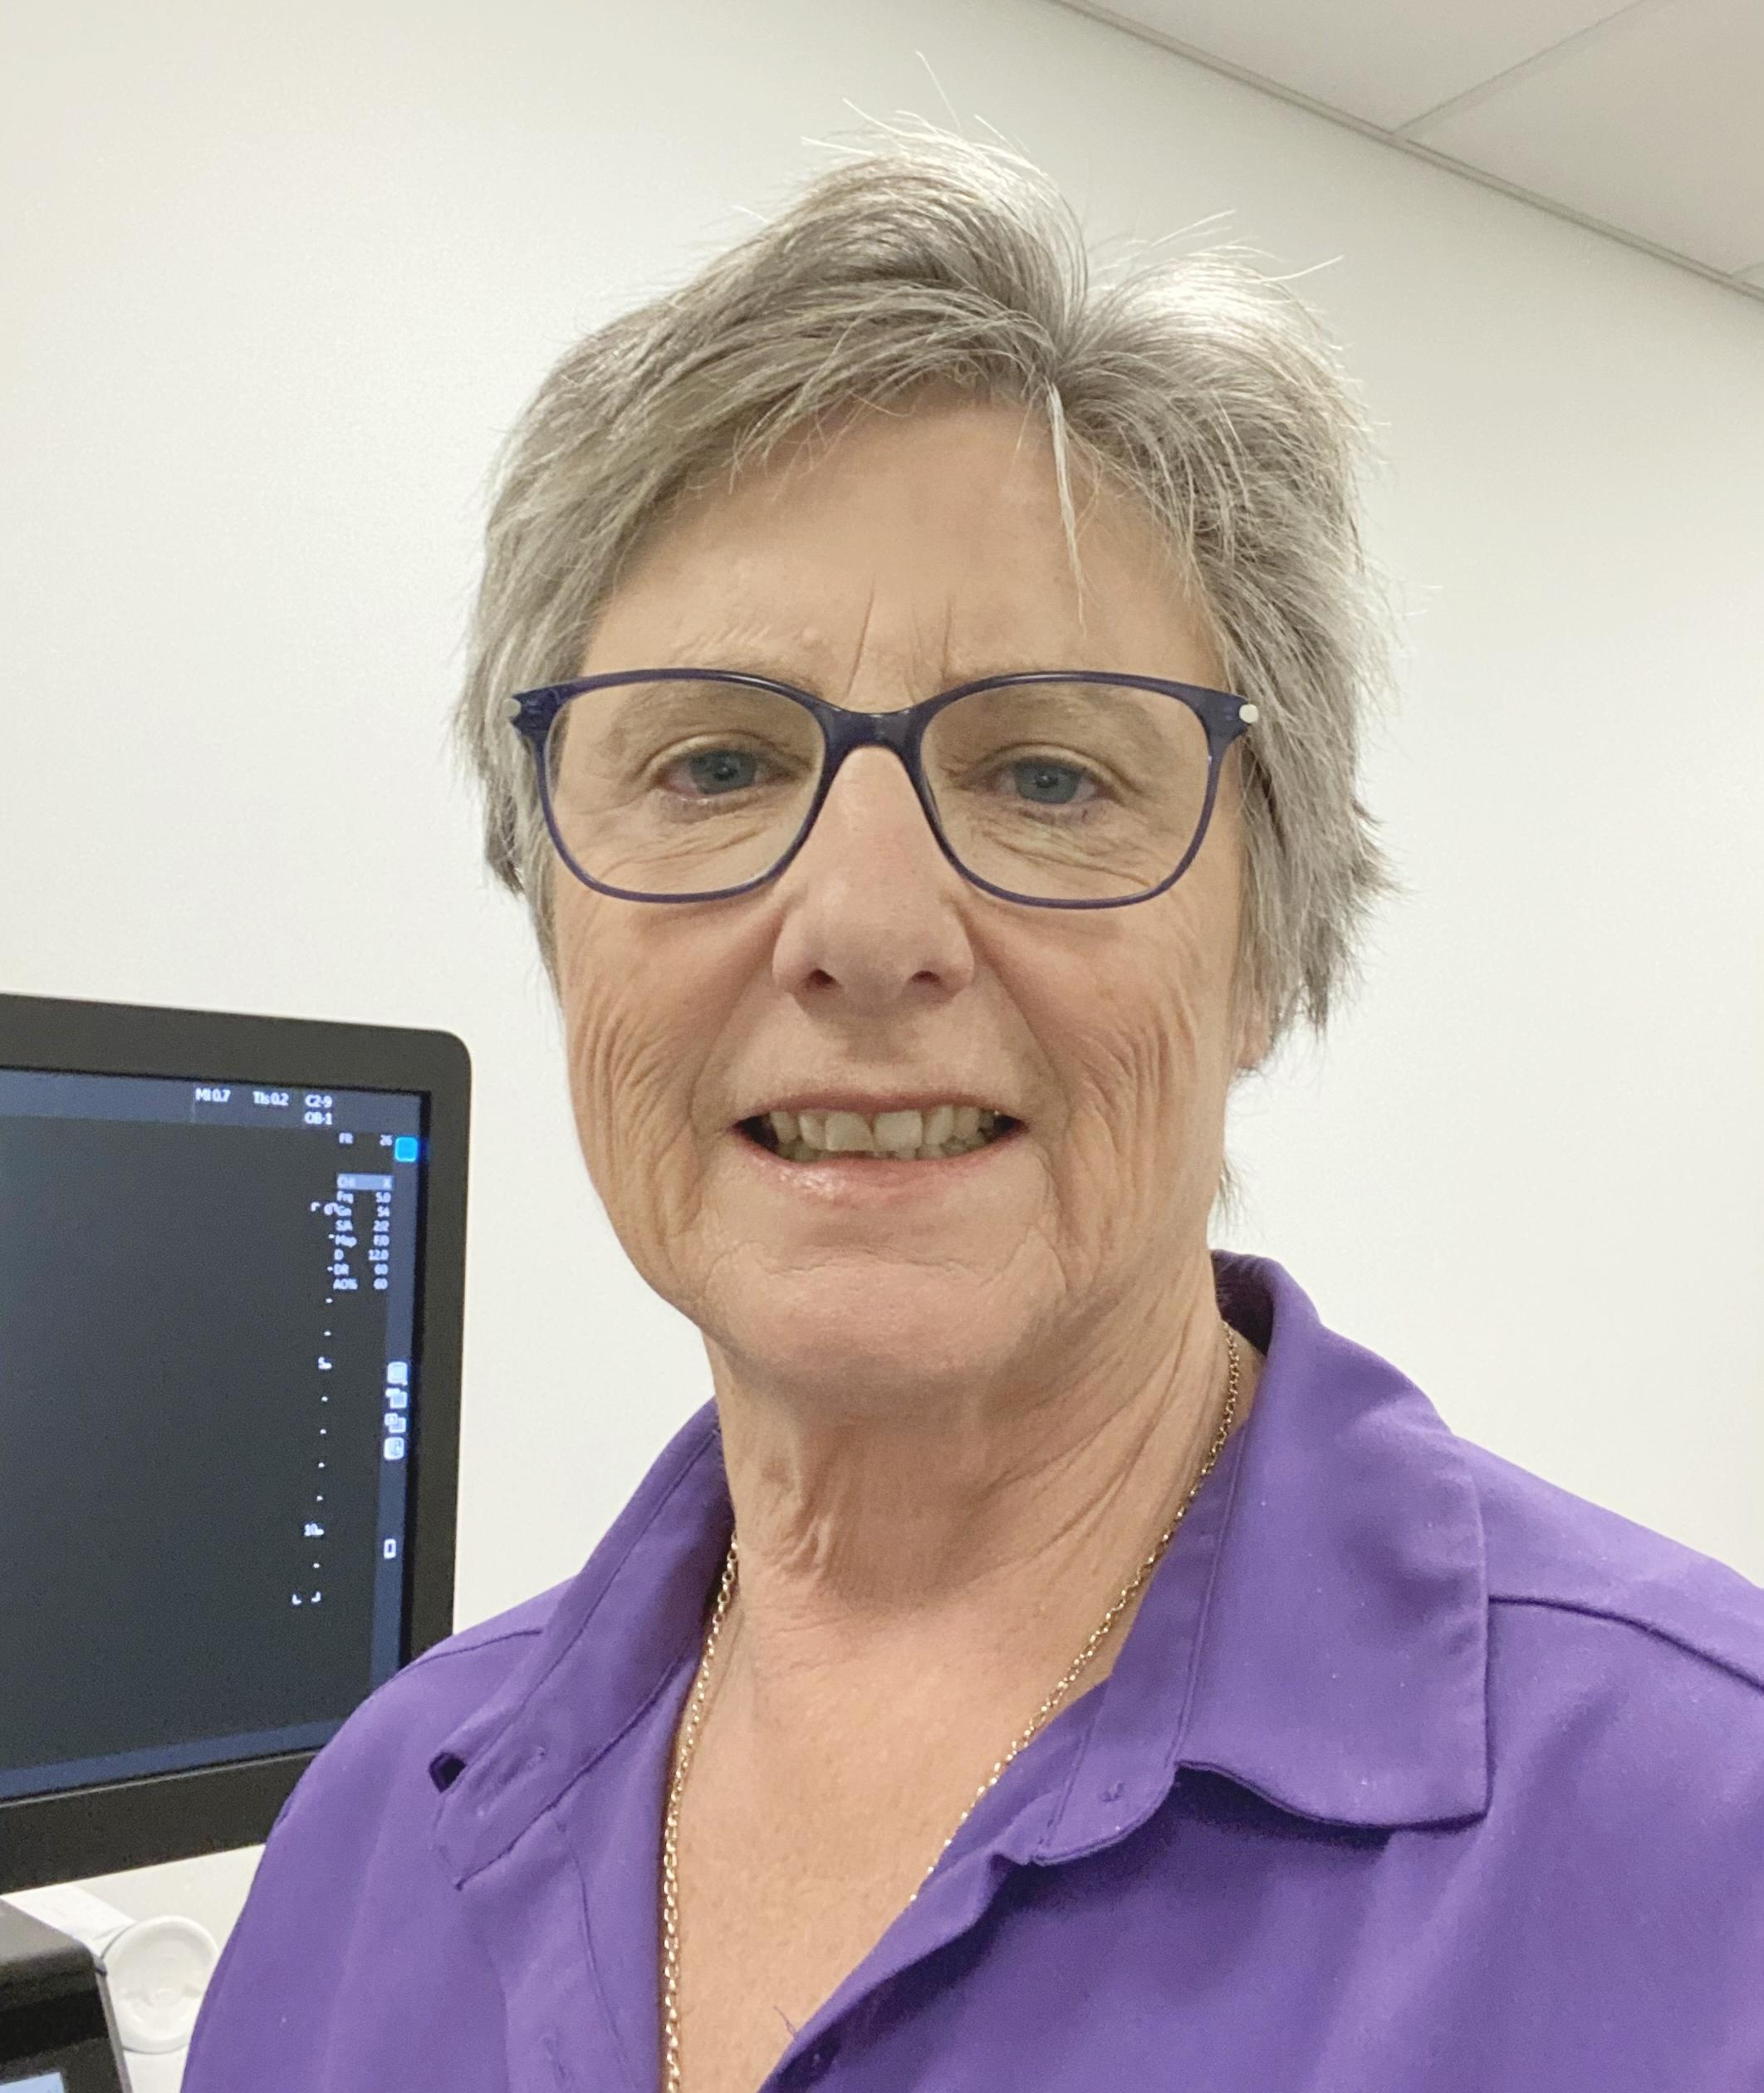 2020 Australasian Sonographer Of The Year - Jill Muirhead